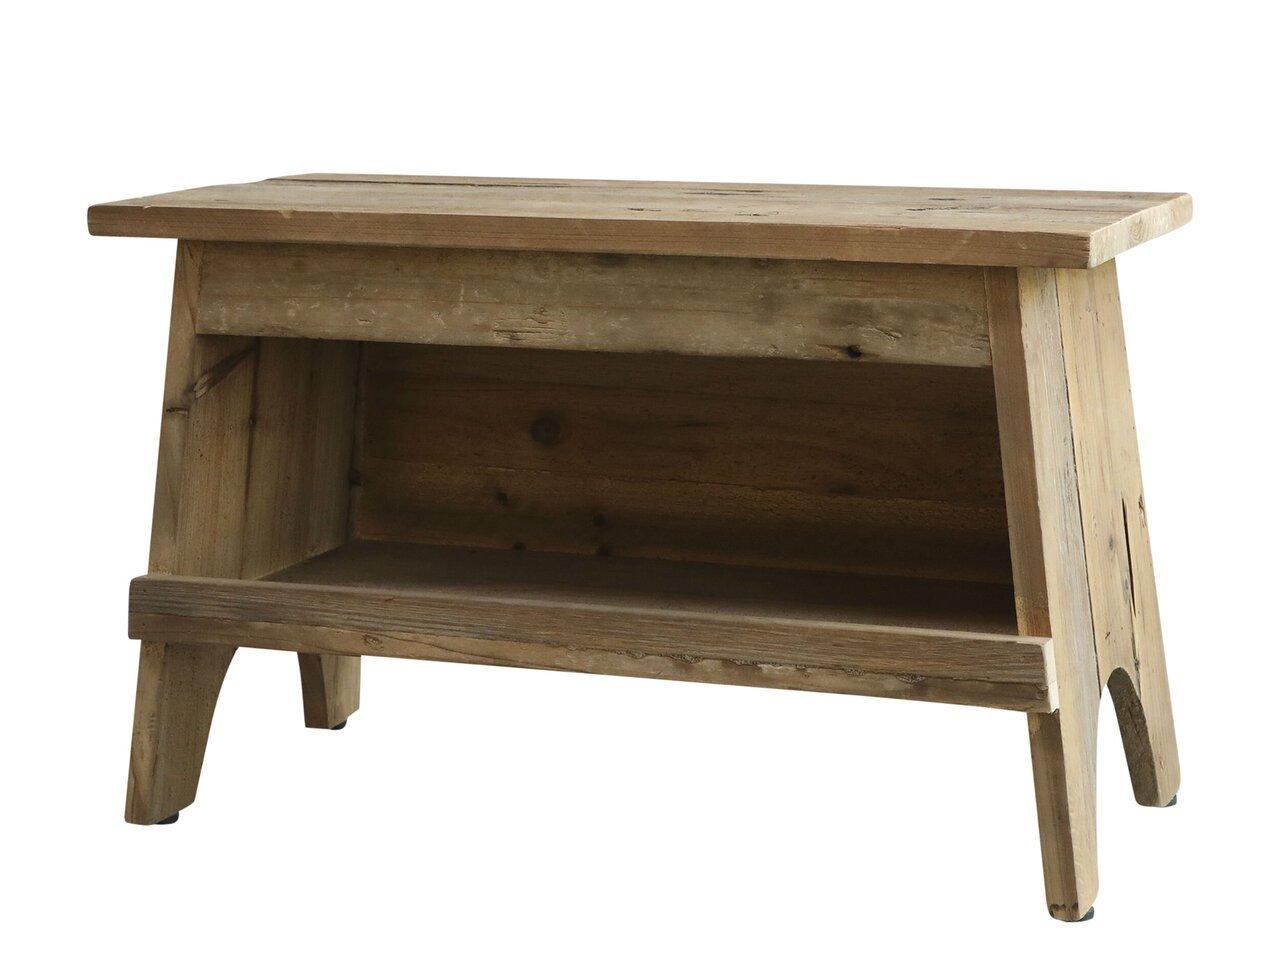 Chic Antique Holz Bank mit Ablage